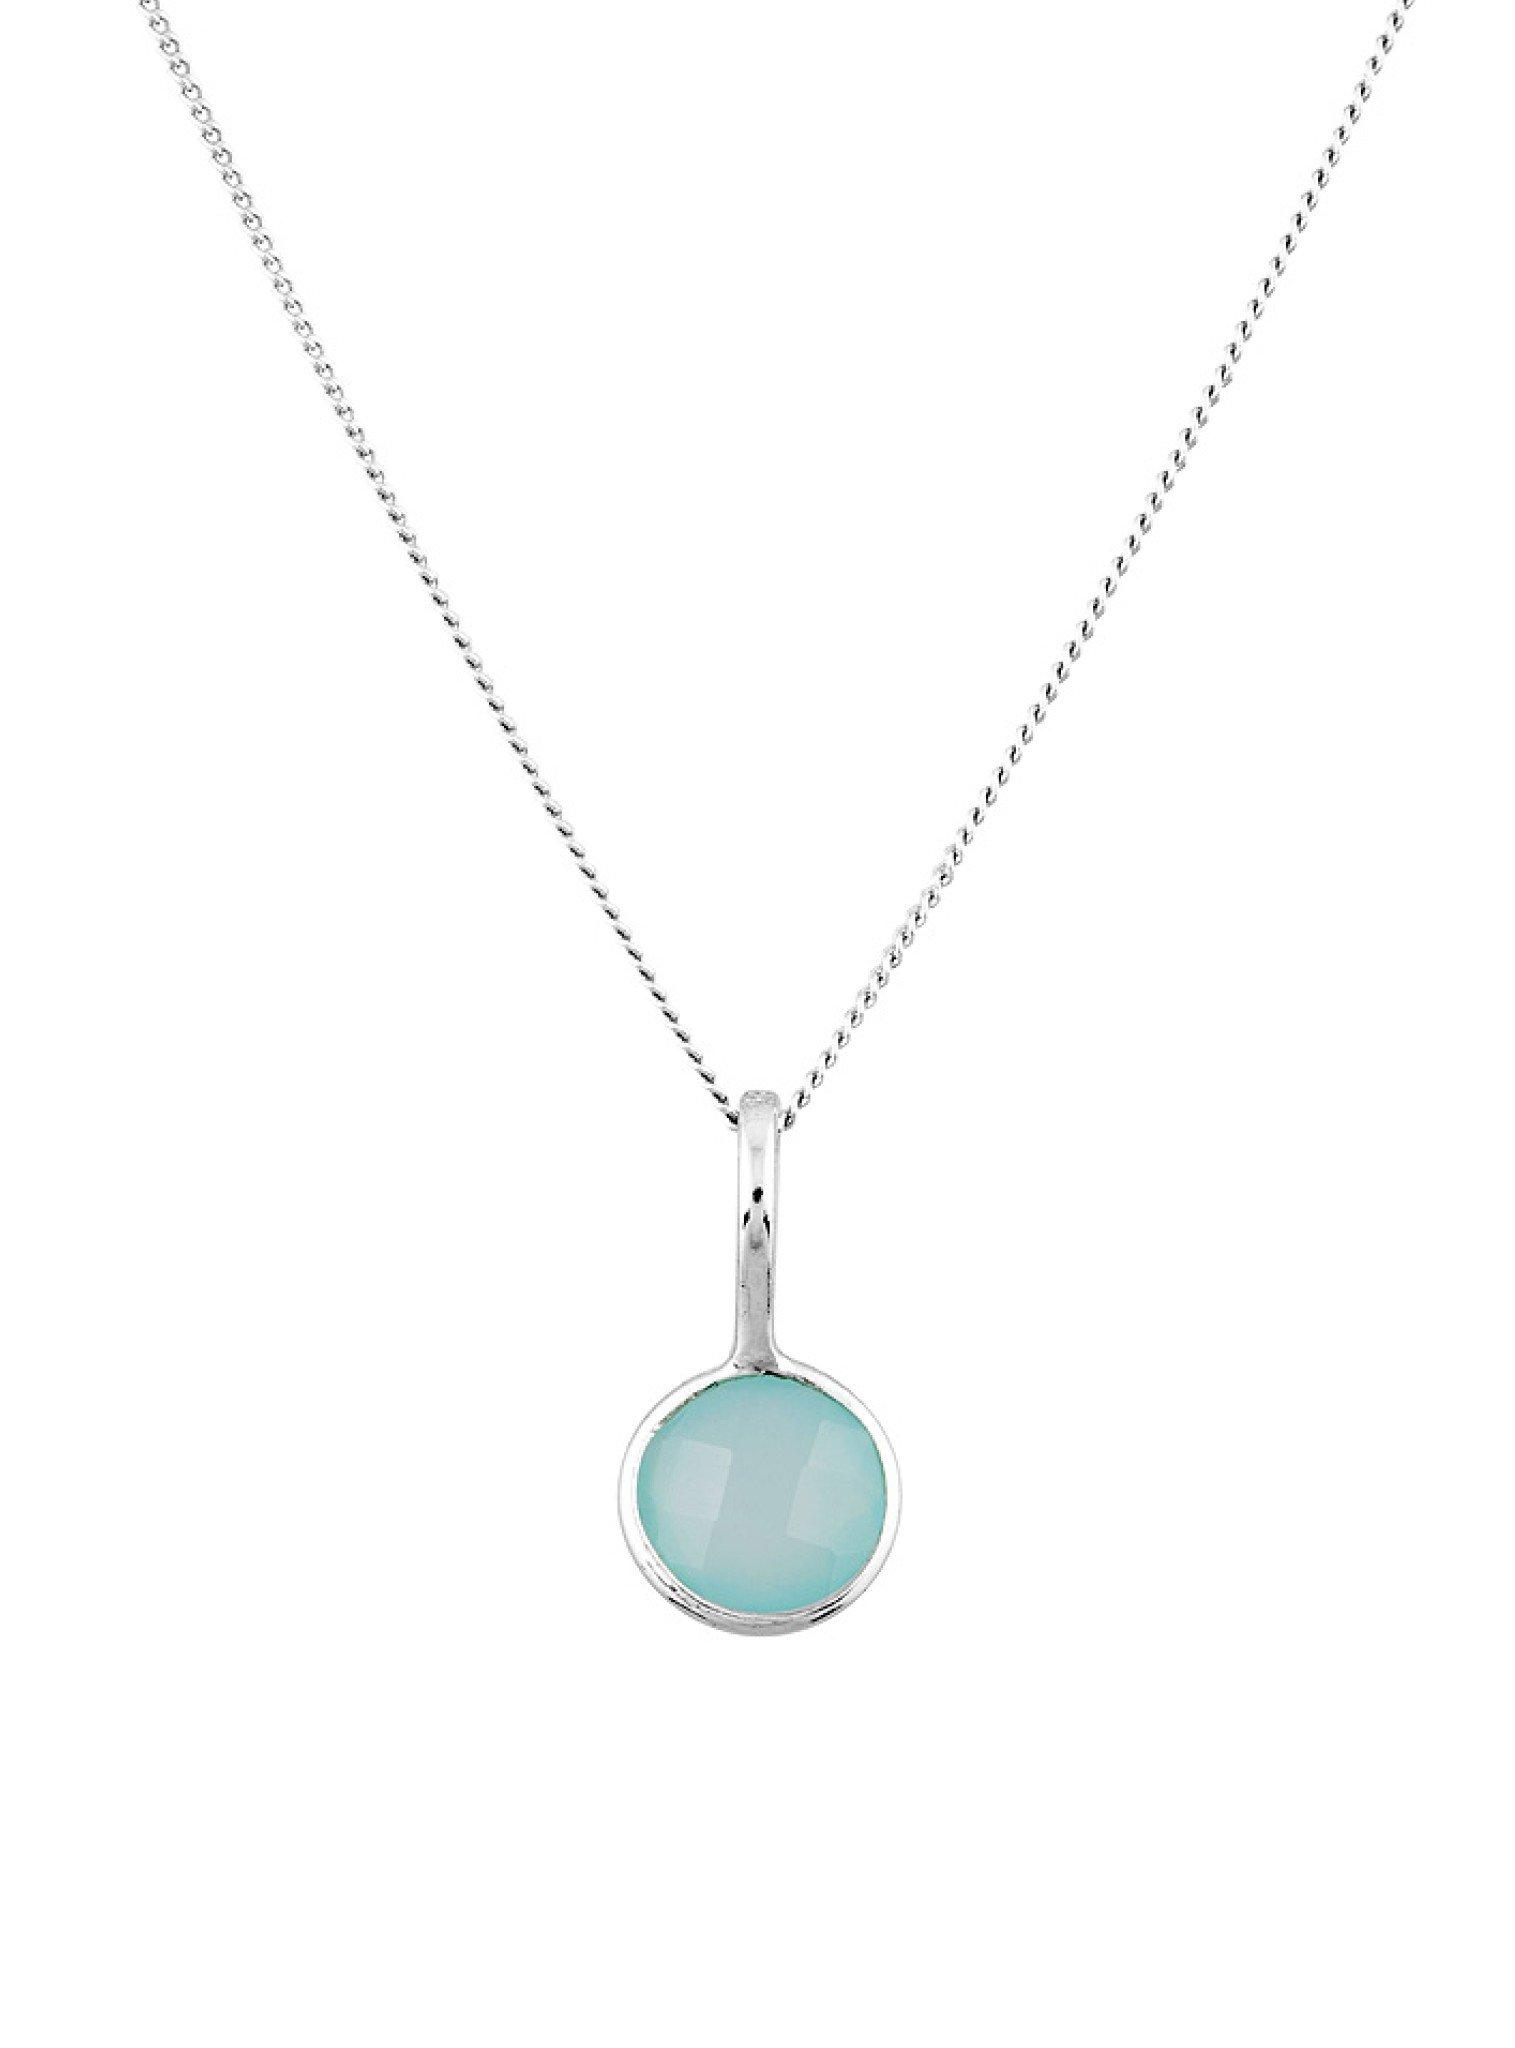 Selene Single Pendant Aqua Chalcedony Necklace in Silver